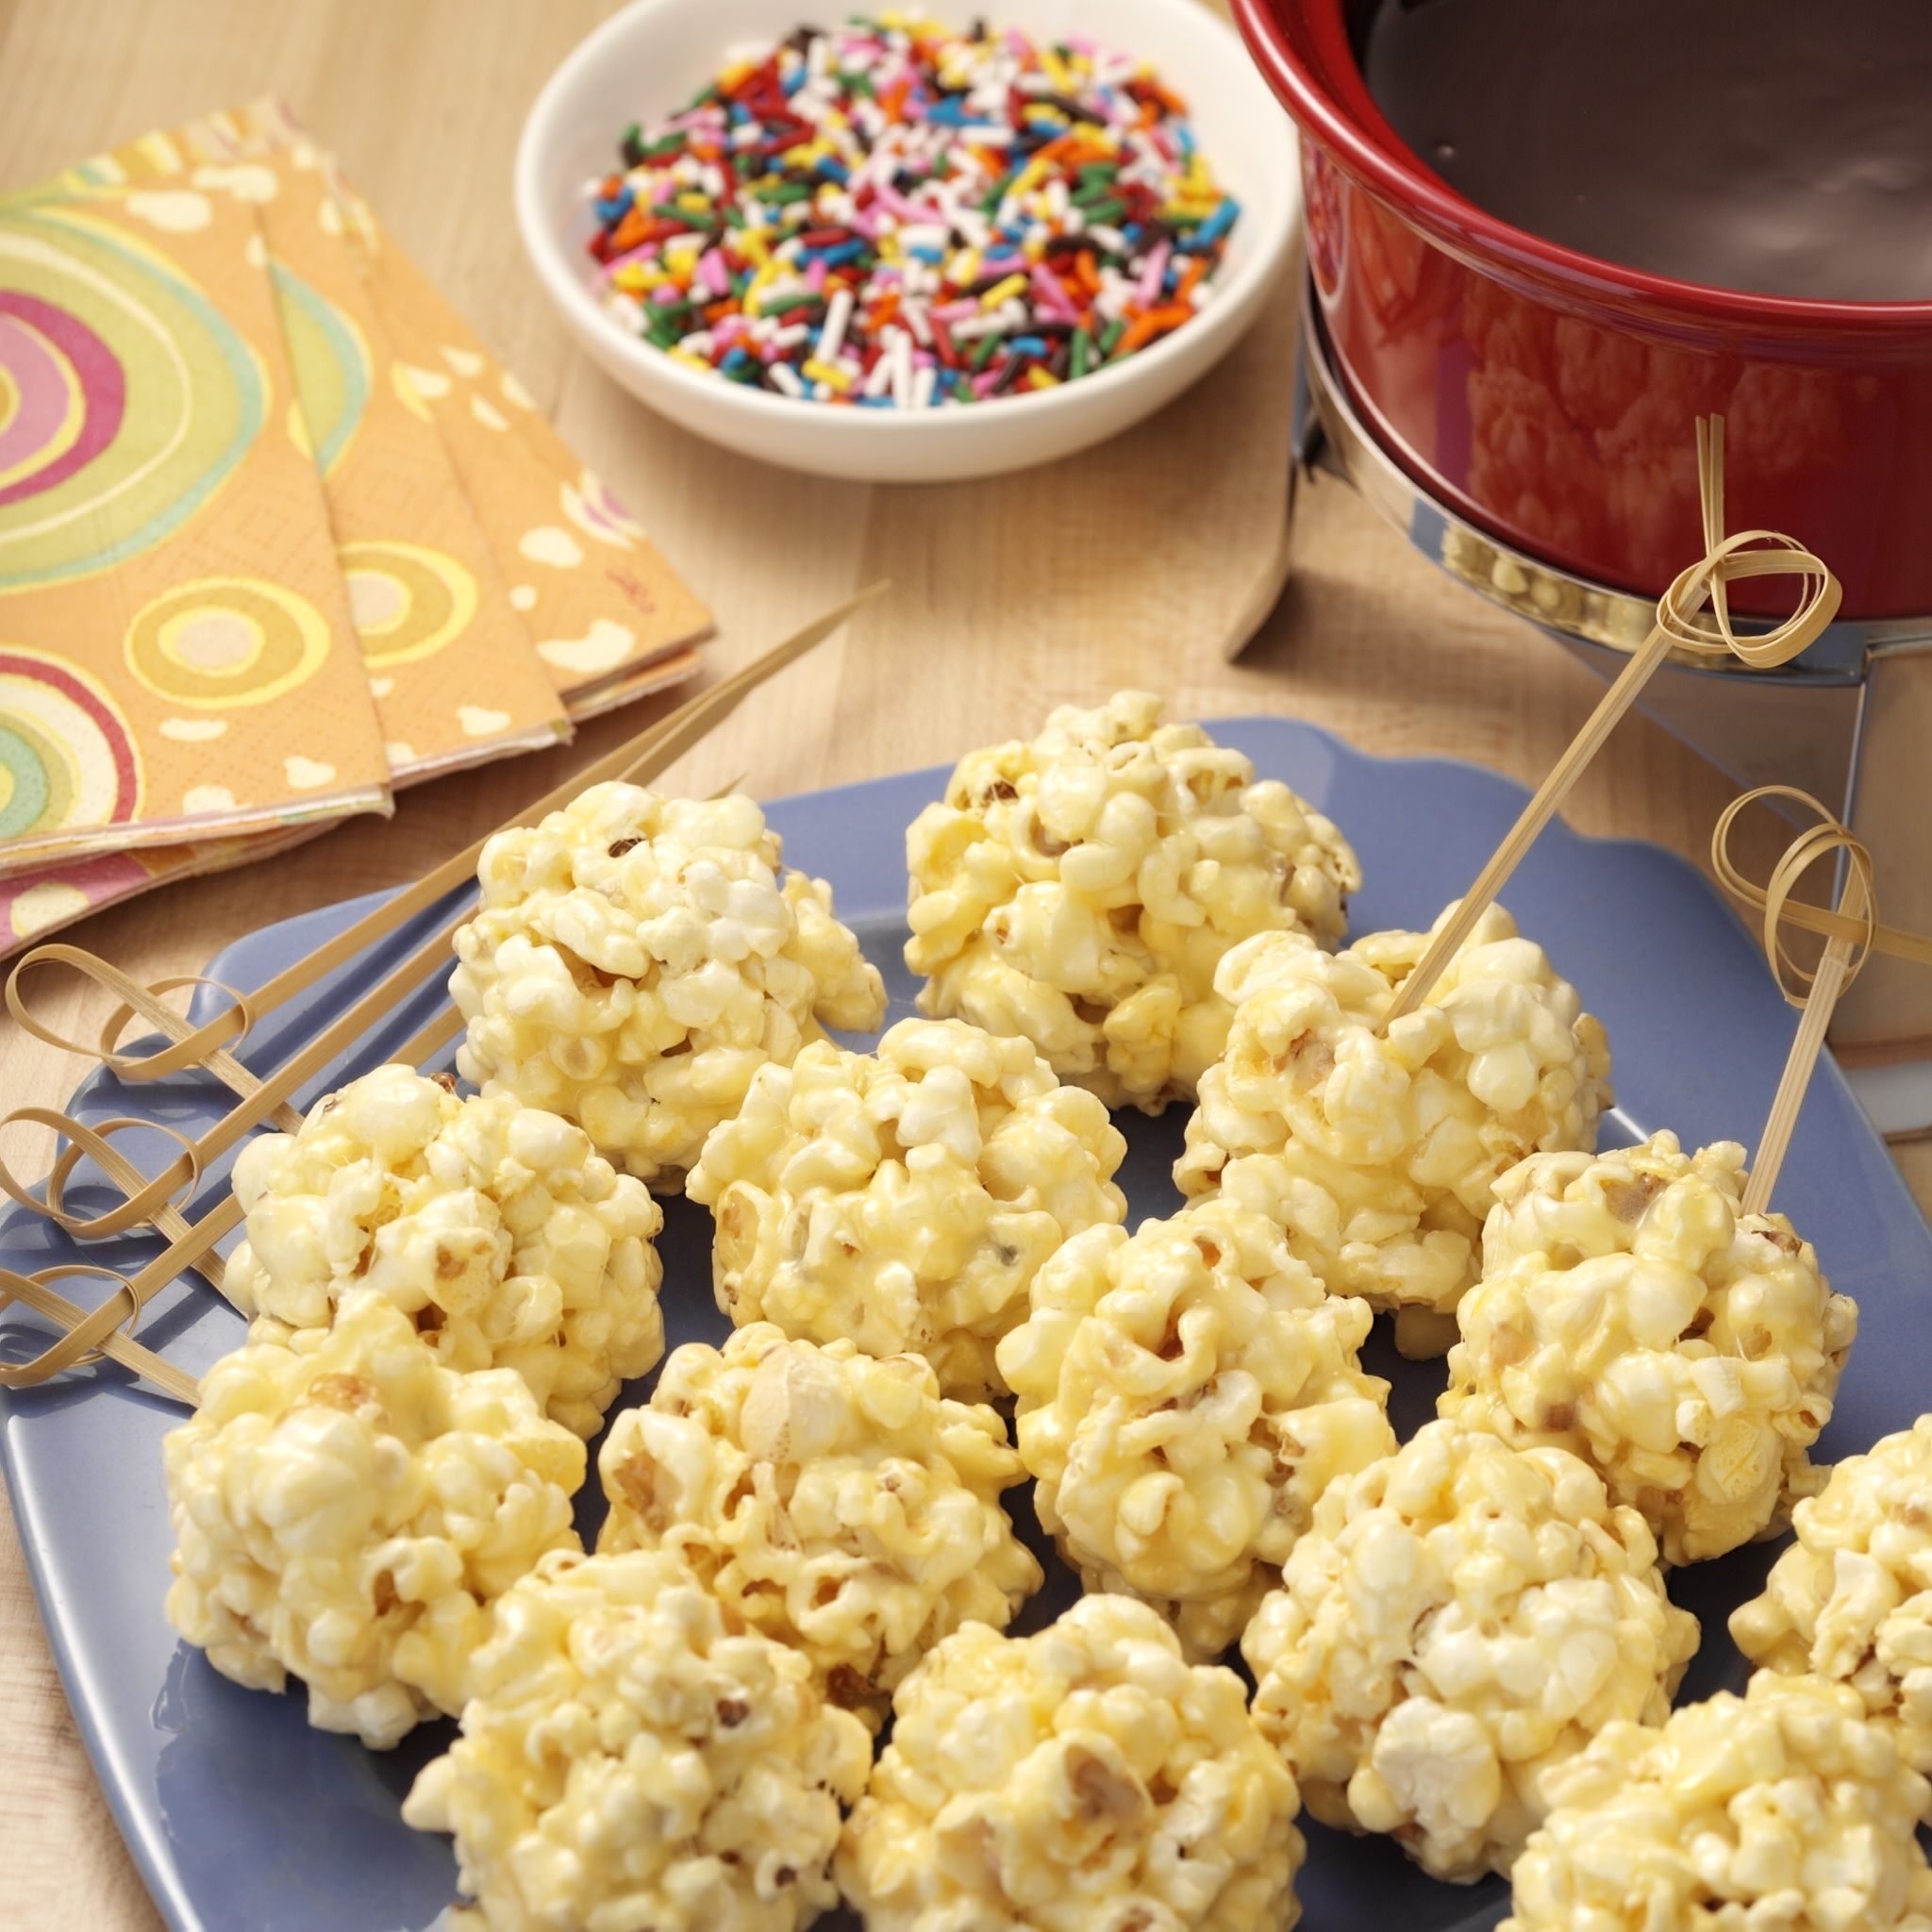 What a cute recipe for a movie night-in! Mini Popcorn Balls with Chocolate Fondue